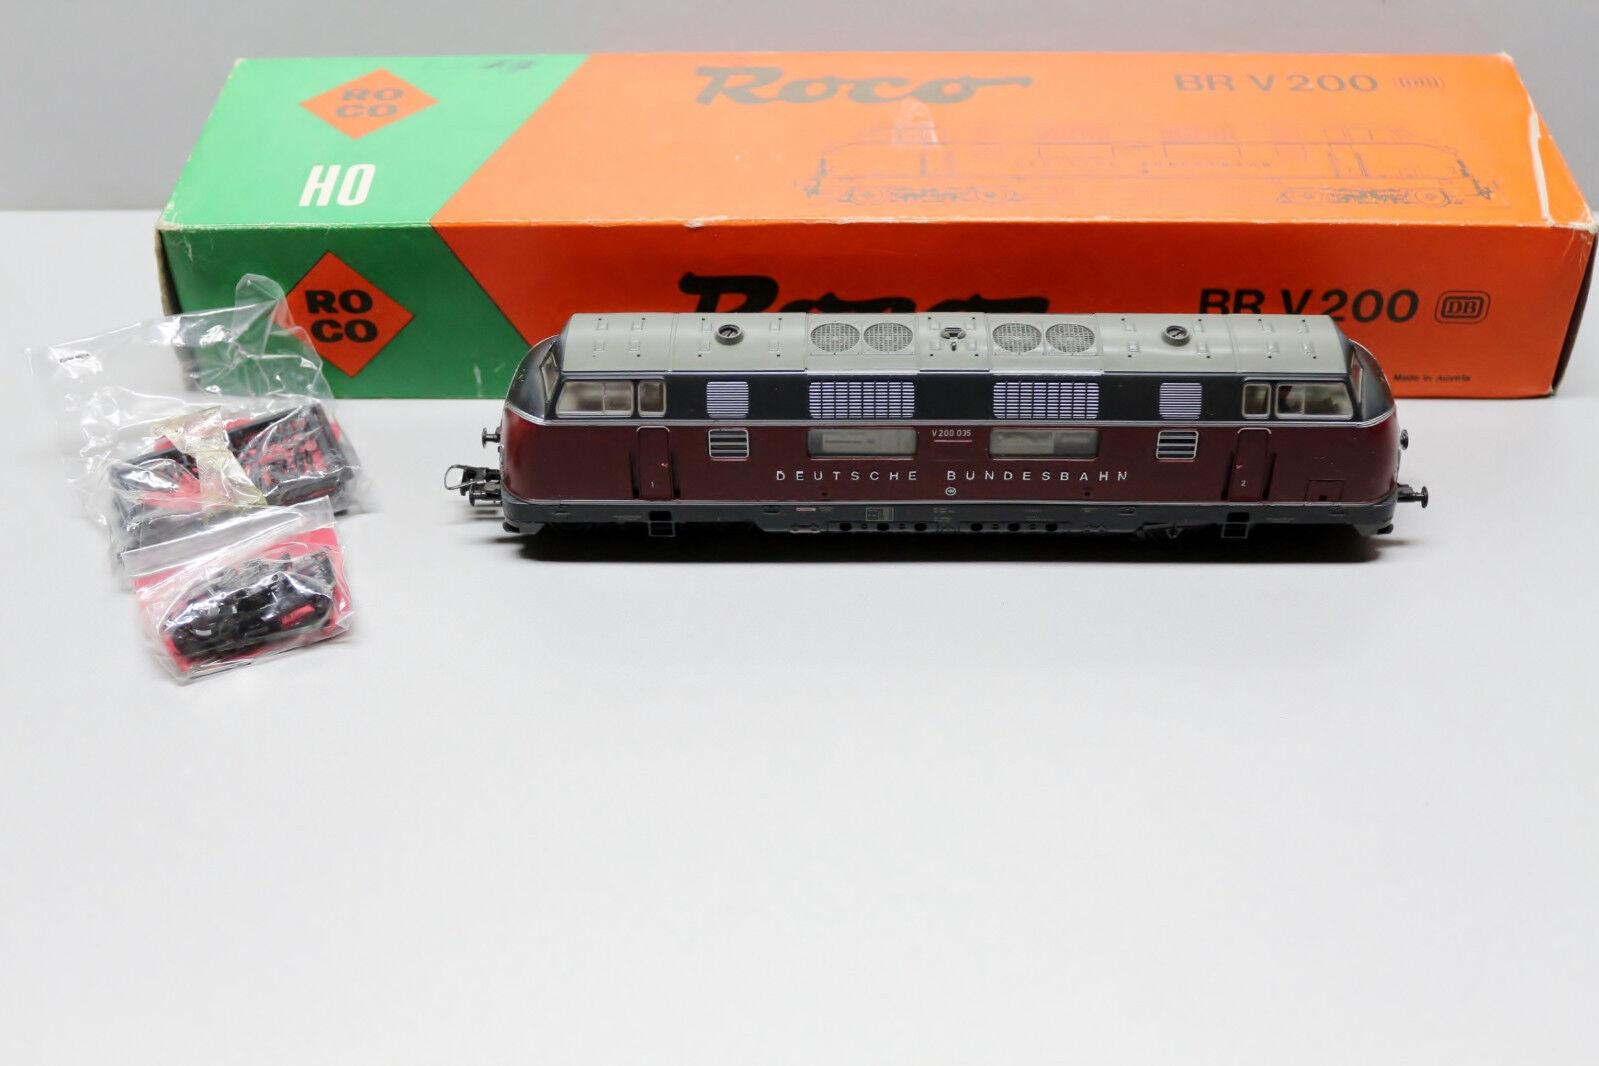 Roco 43928 corriente alterna digital diesellok serie v200 035 pista h0 OVP